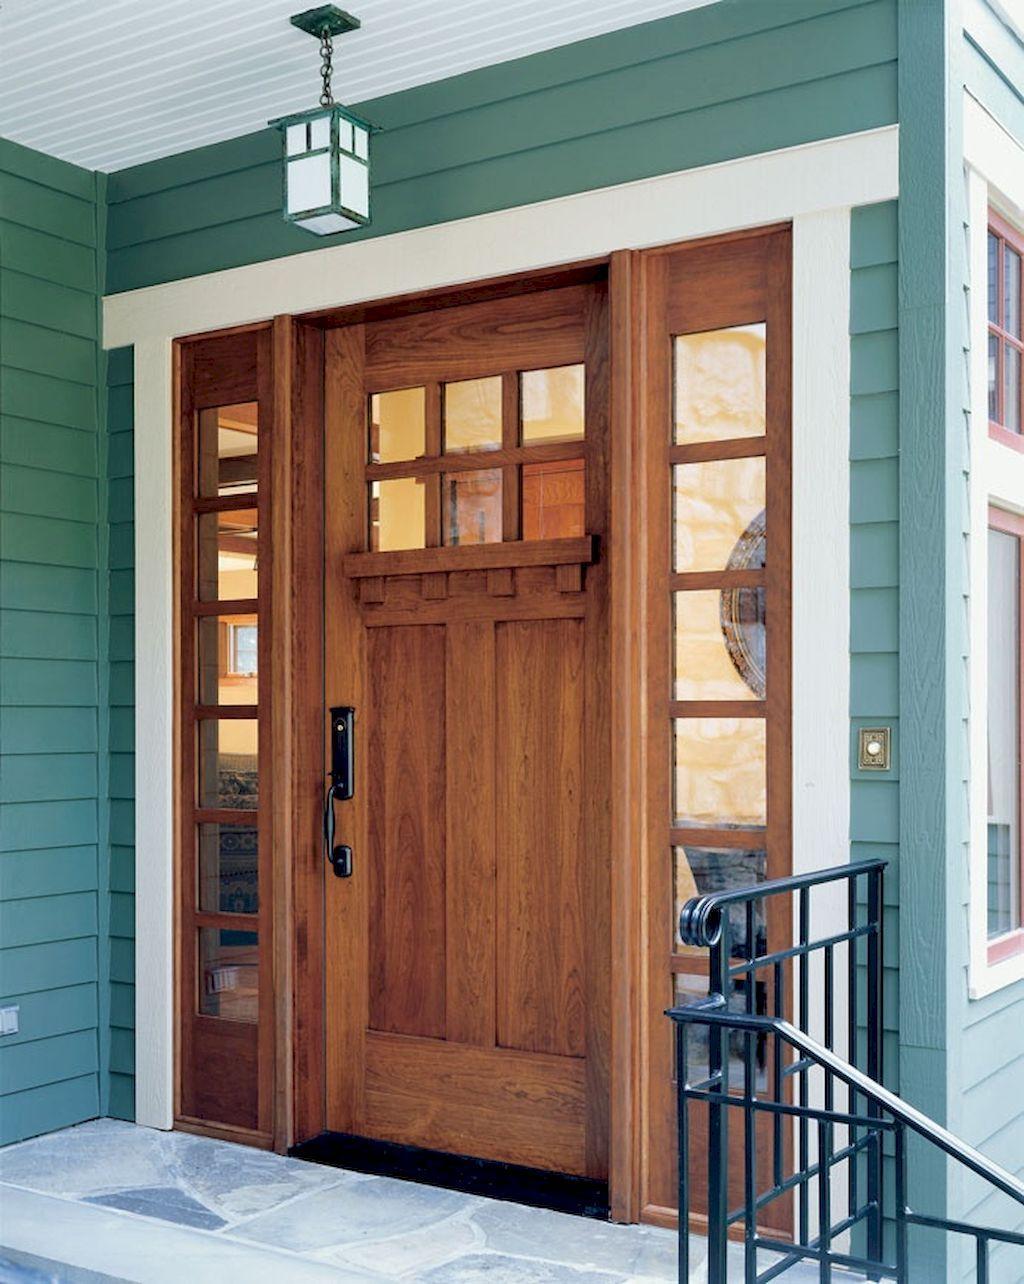 Front door with sidelites m6410 103010 ct 4irh the home depot - 43 Marvelous Front Door With Sidelights